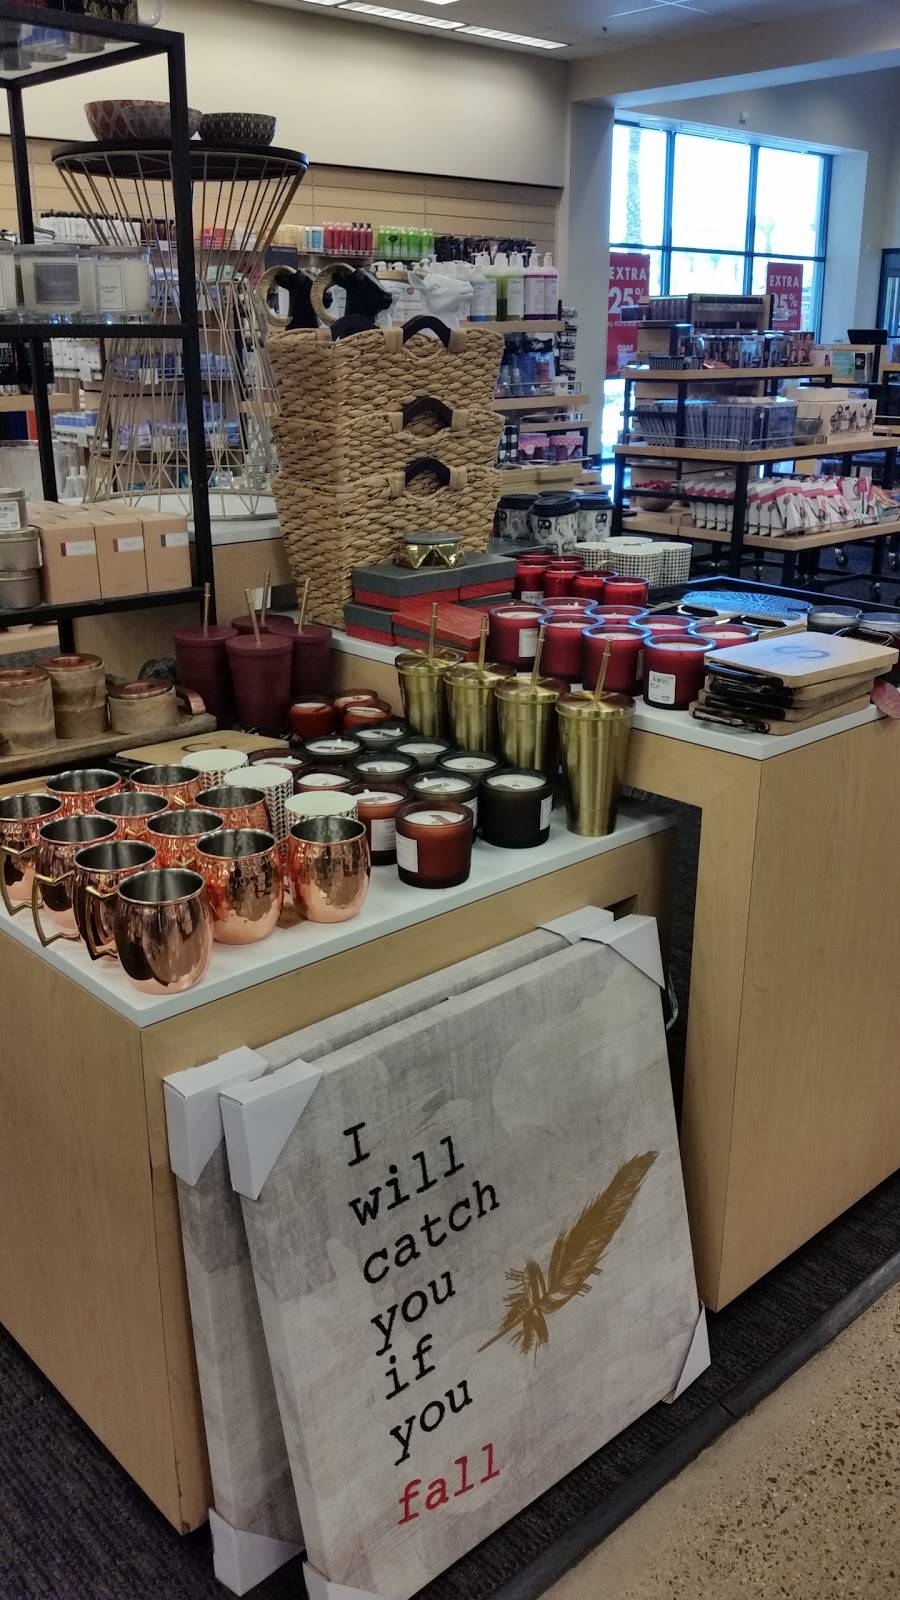 Nordstrom Rack Stephanie Street Center - department store  | Photo 2 of 9 | Address: 579 N Stephanie St, Henderson, NV 89014, USA | Phone: (702) 948-2121